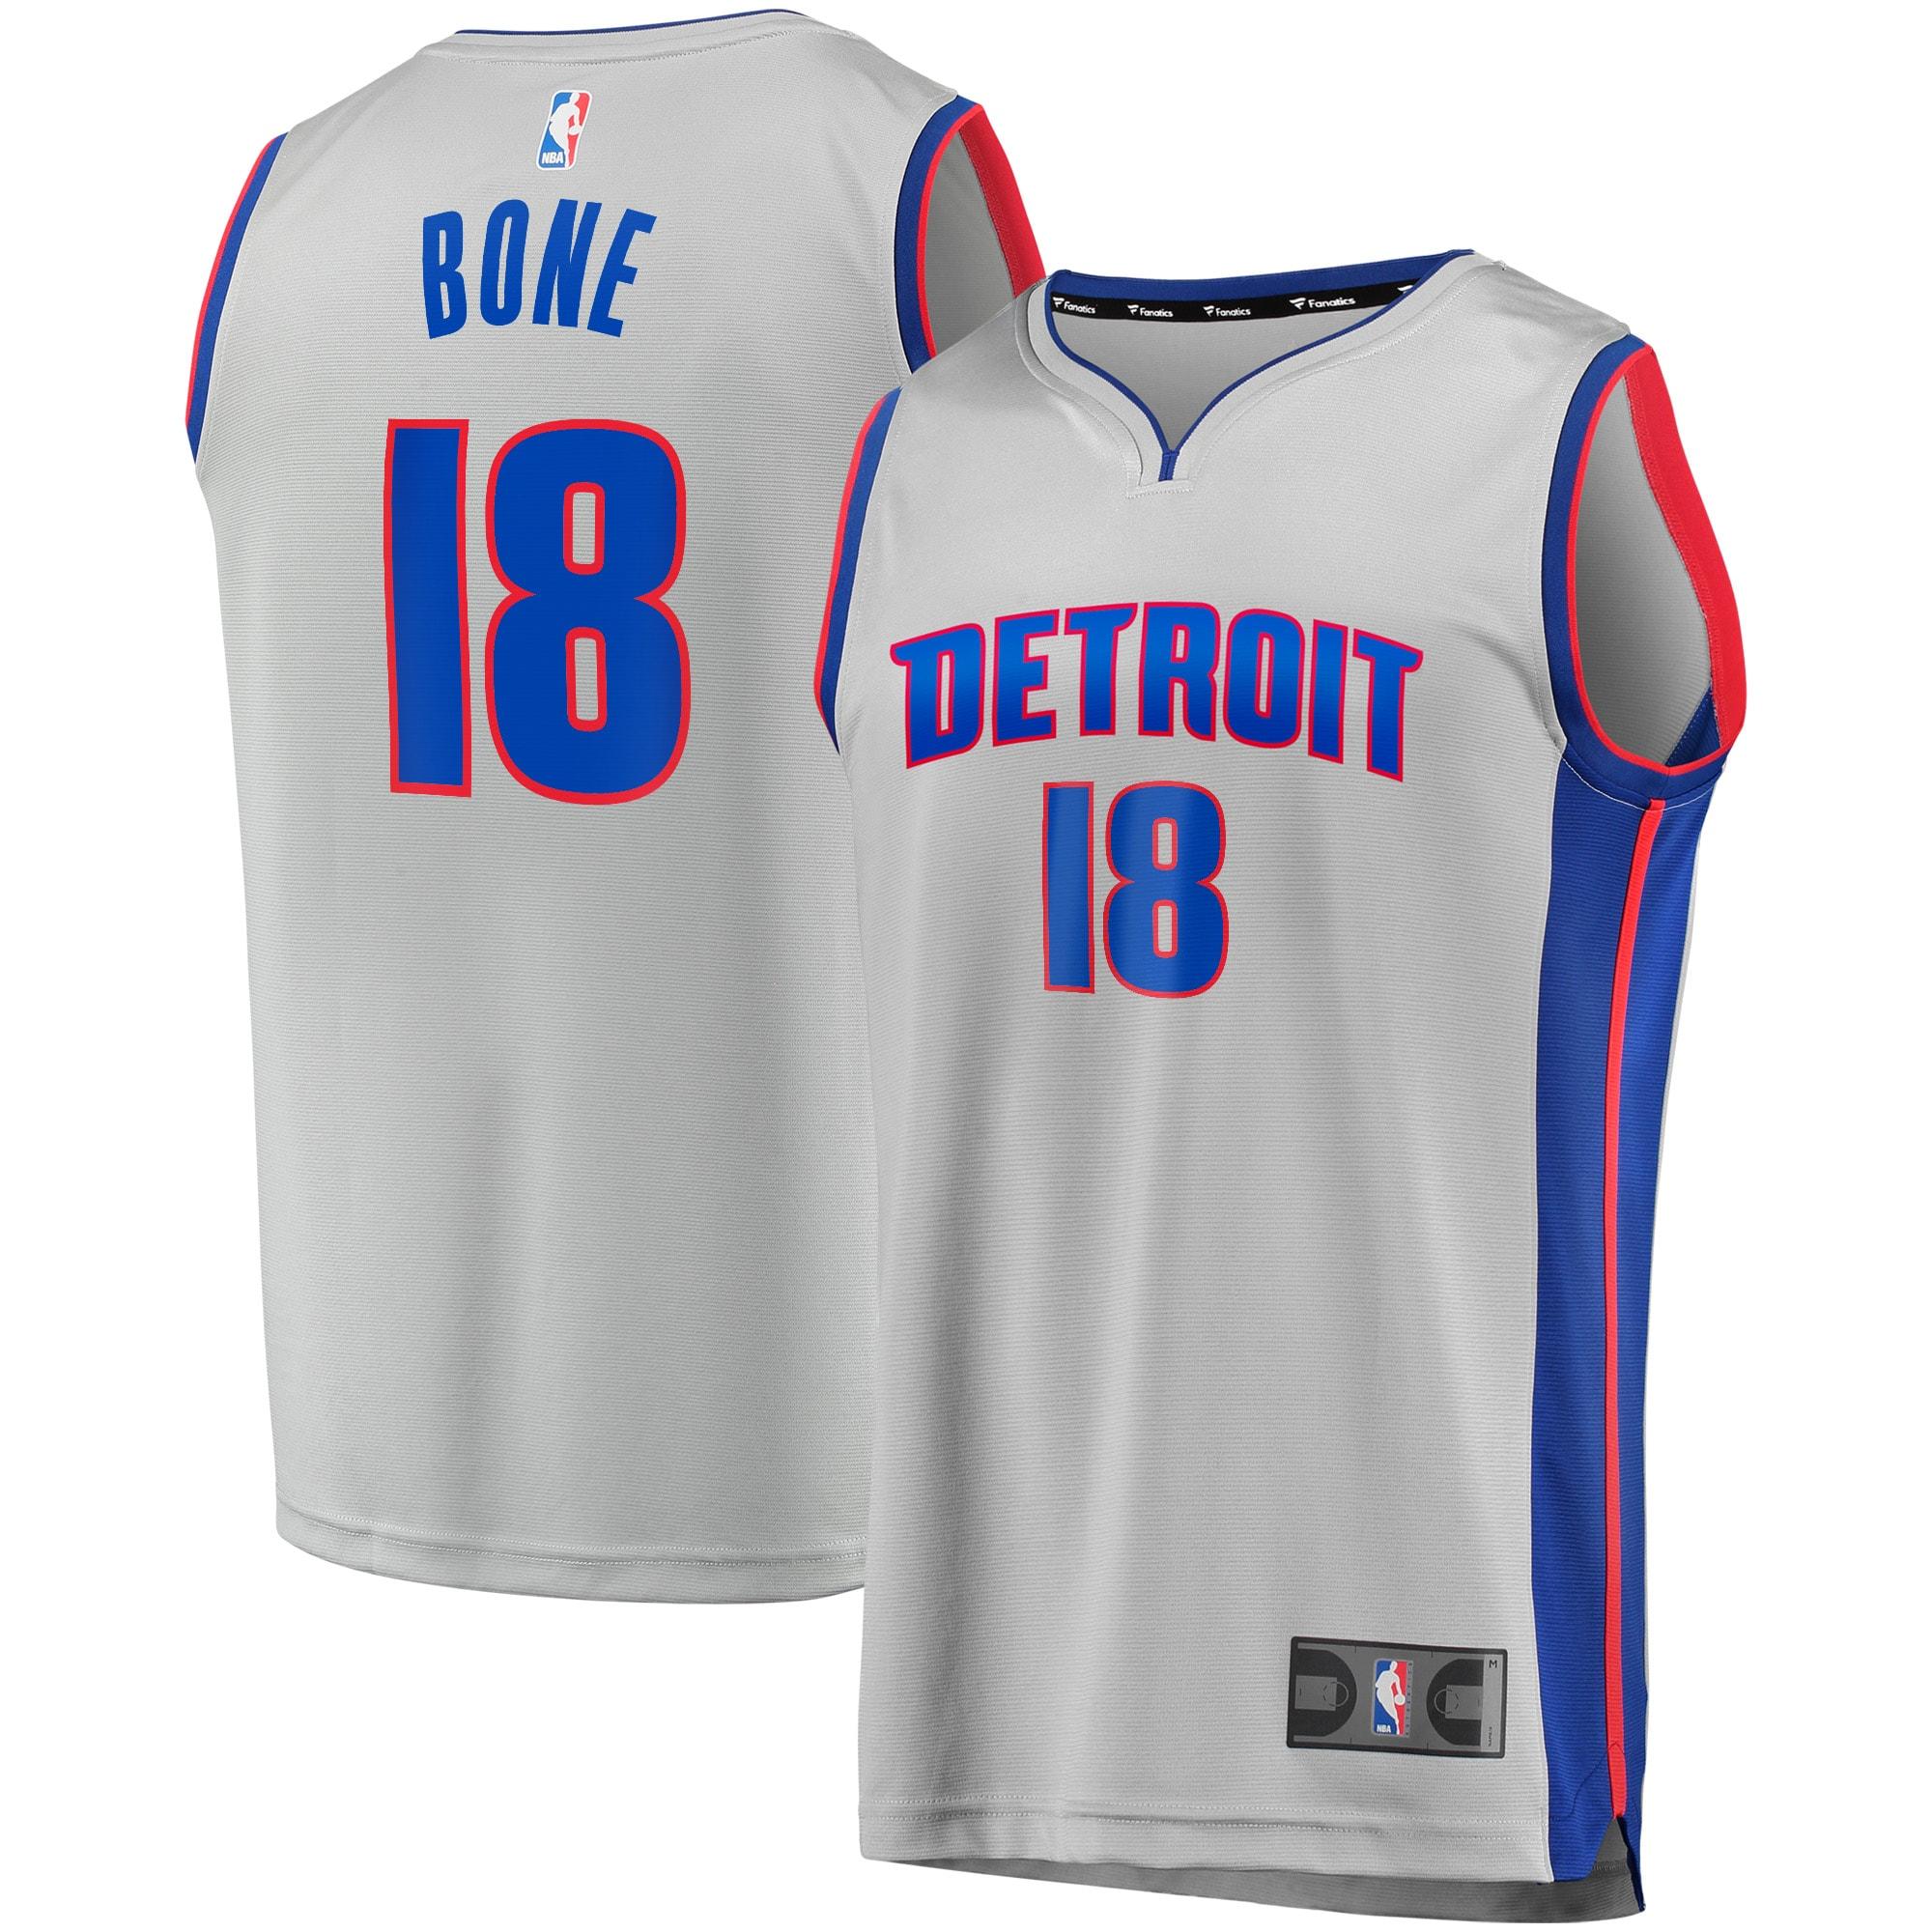 Jordan Bone Detroit Pistons Fanatics Branded Fast Break Replica Player Team Jersey - Statement Edition - Gray